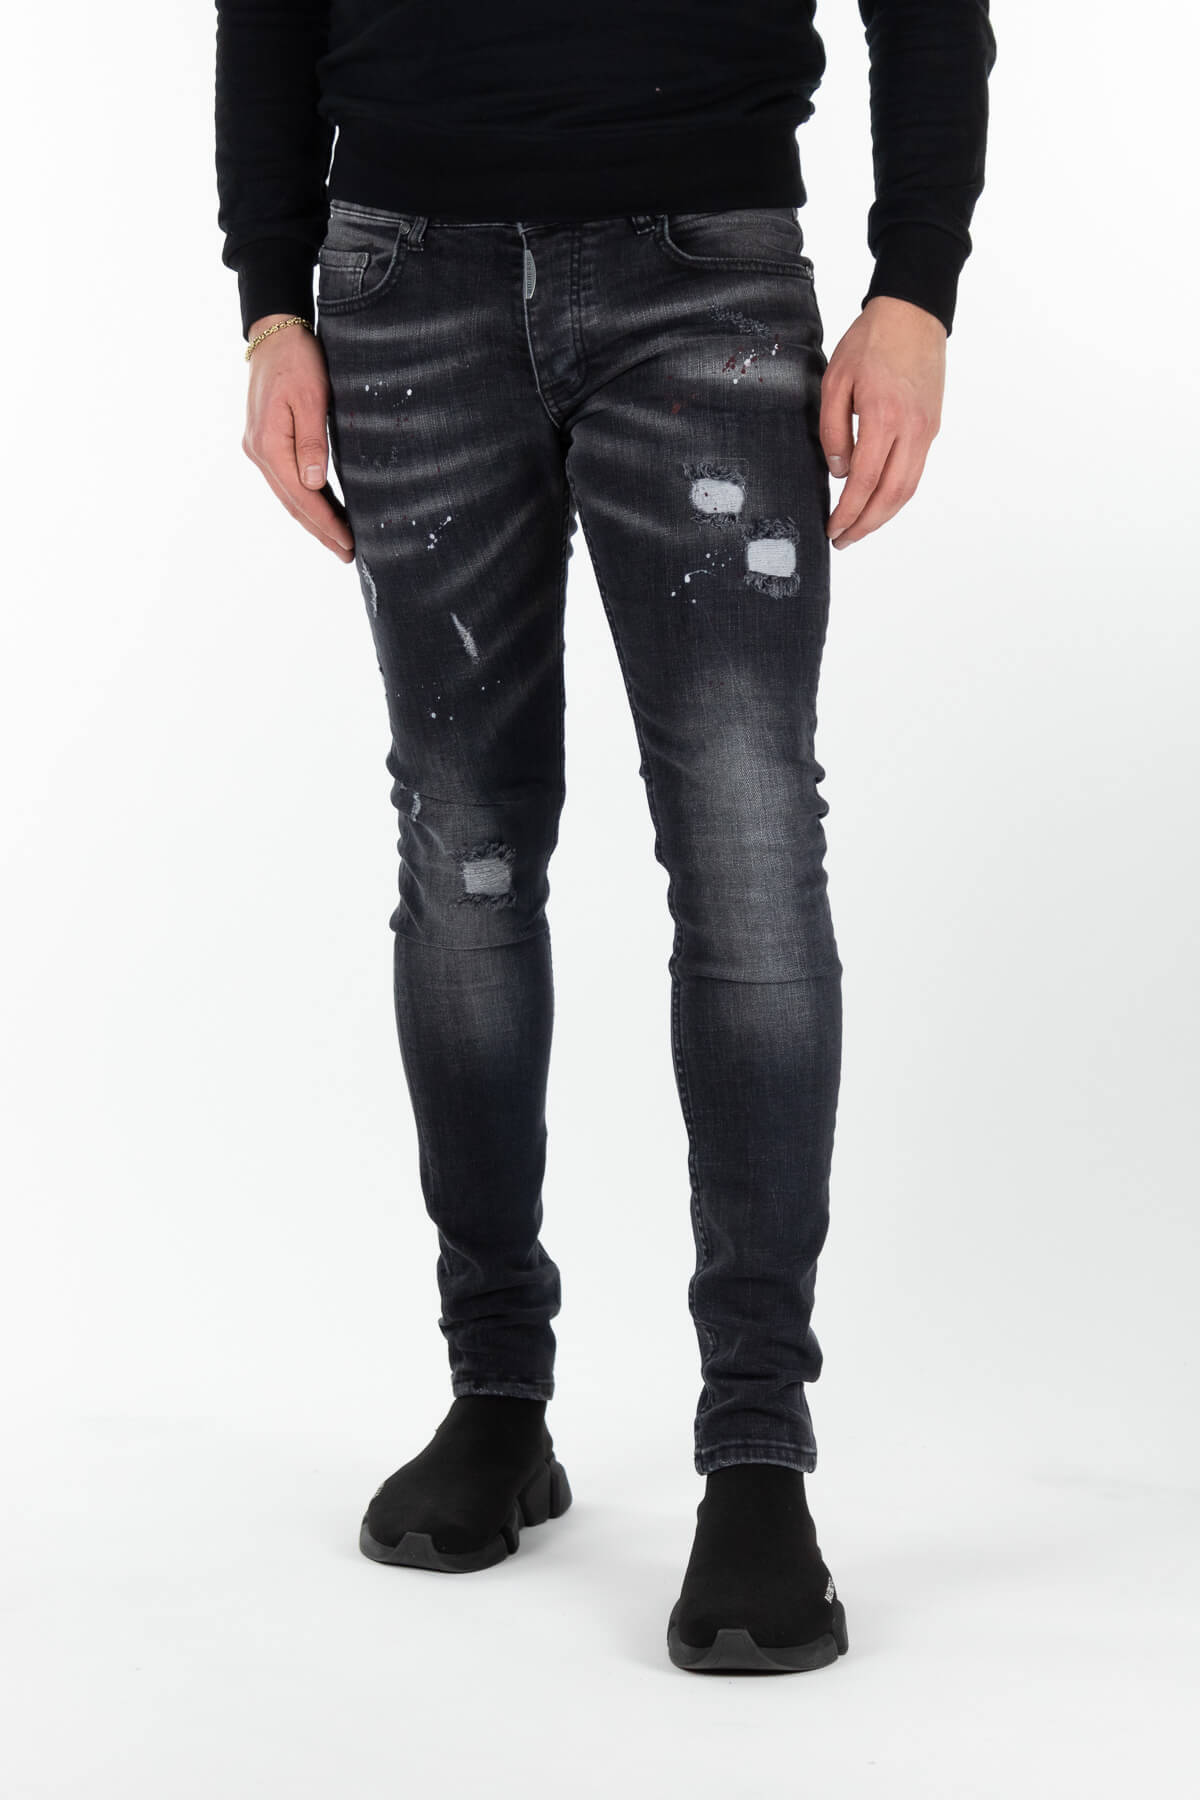 Sevilla Deluxe Dark Jeans-1